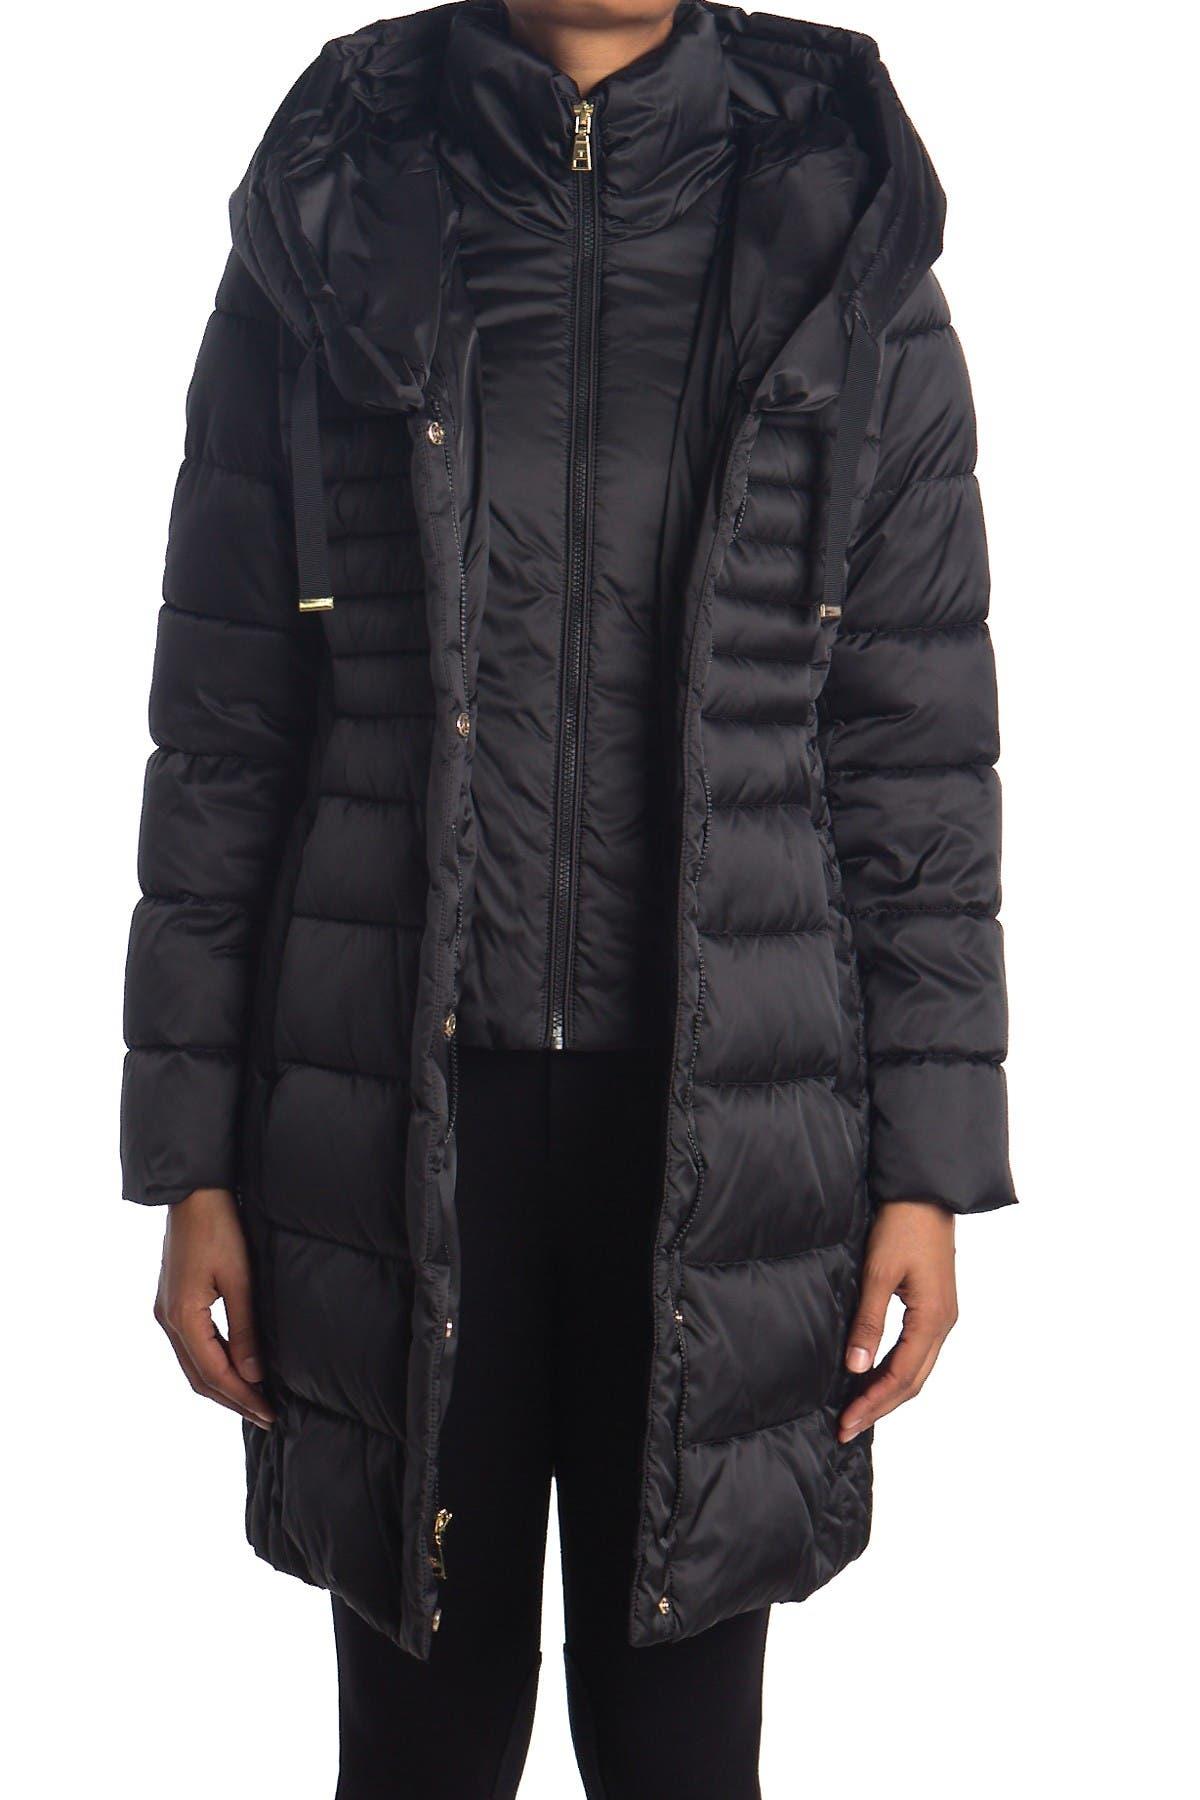 Tahari Hooded Bib Quilted Long Puffer Jacket